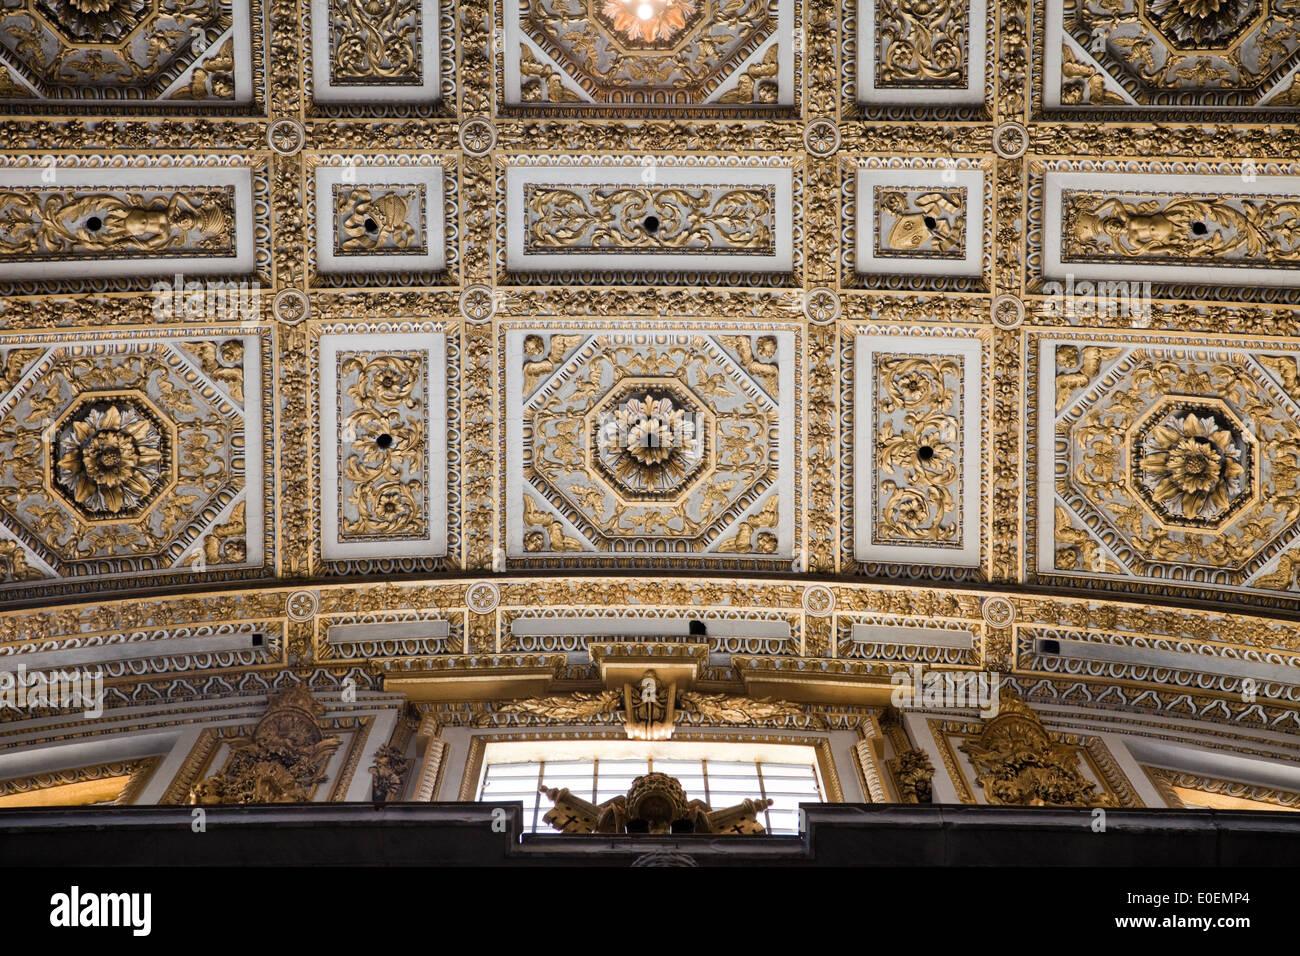 Petersdom, Vatikan - St. Peter's Basilica, Vatican - Stock Image